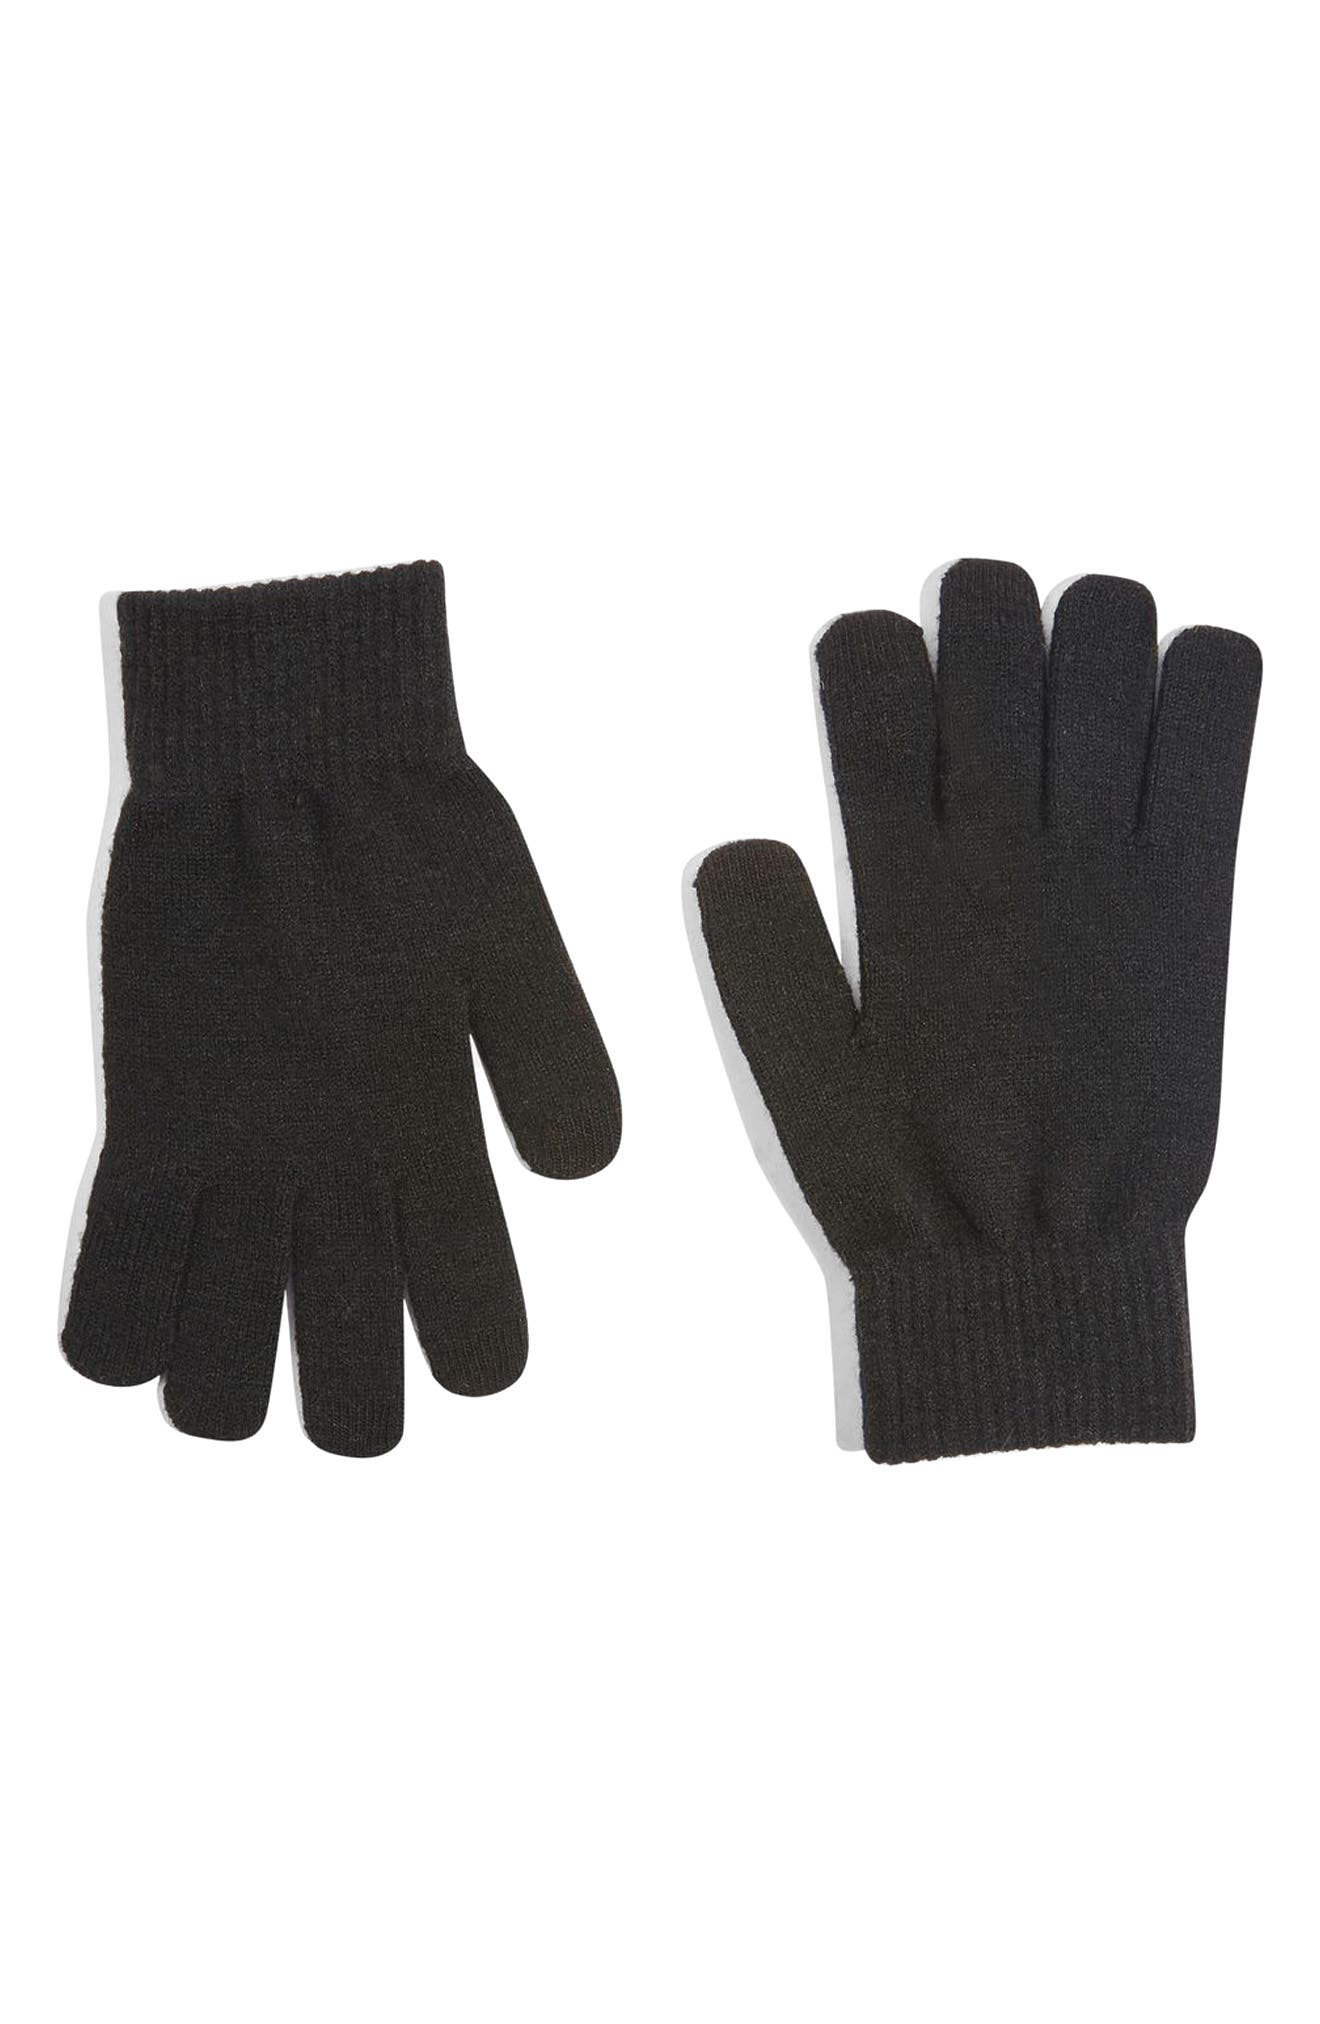 Main Image - Topshop Core Winter Tech Gloves